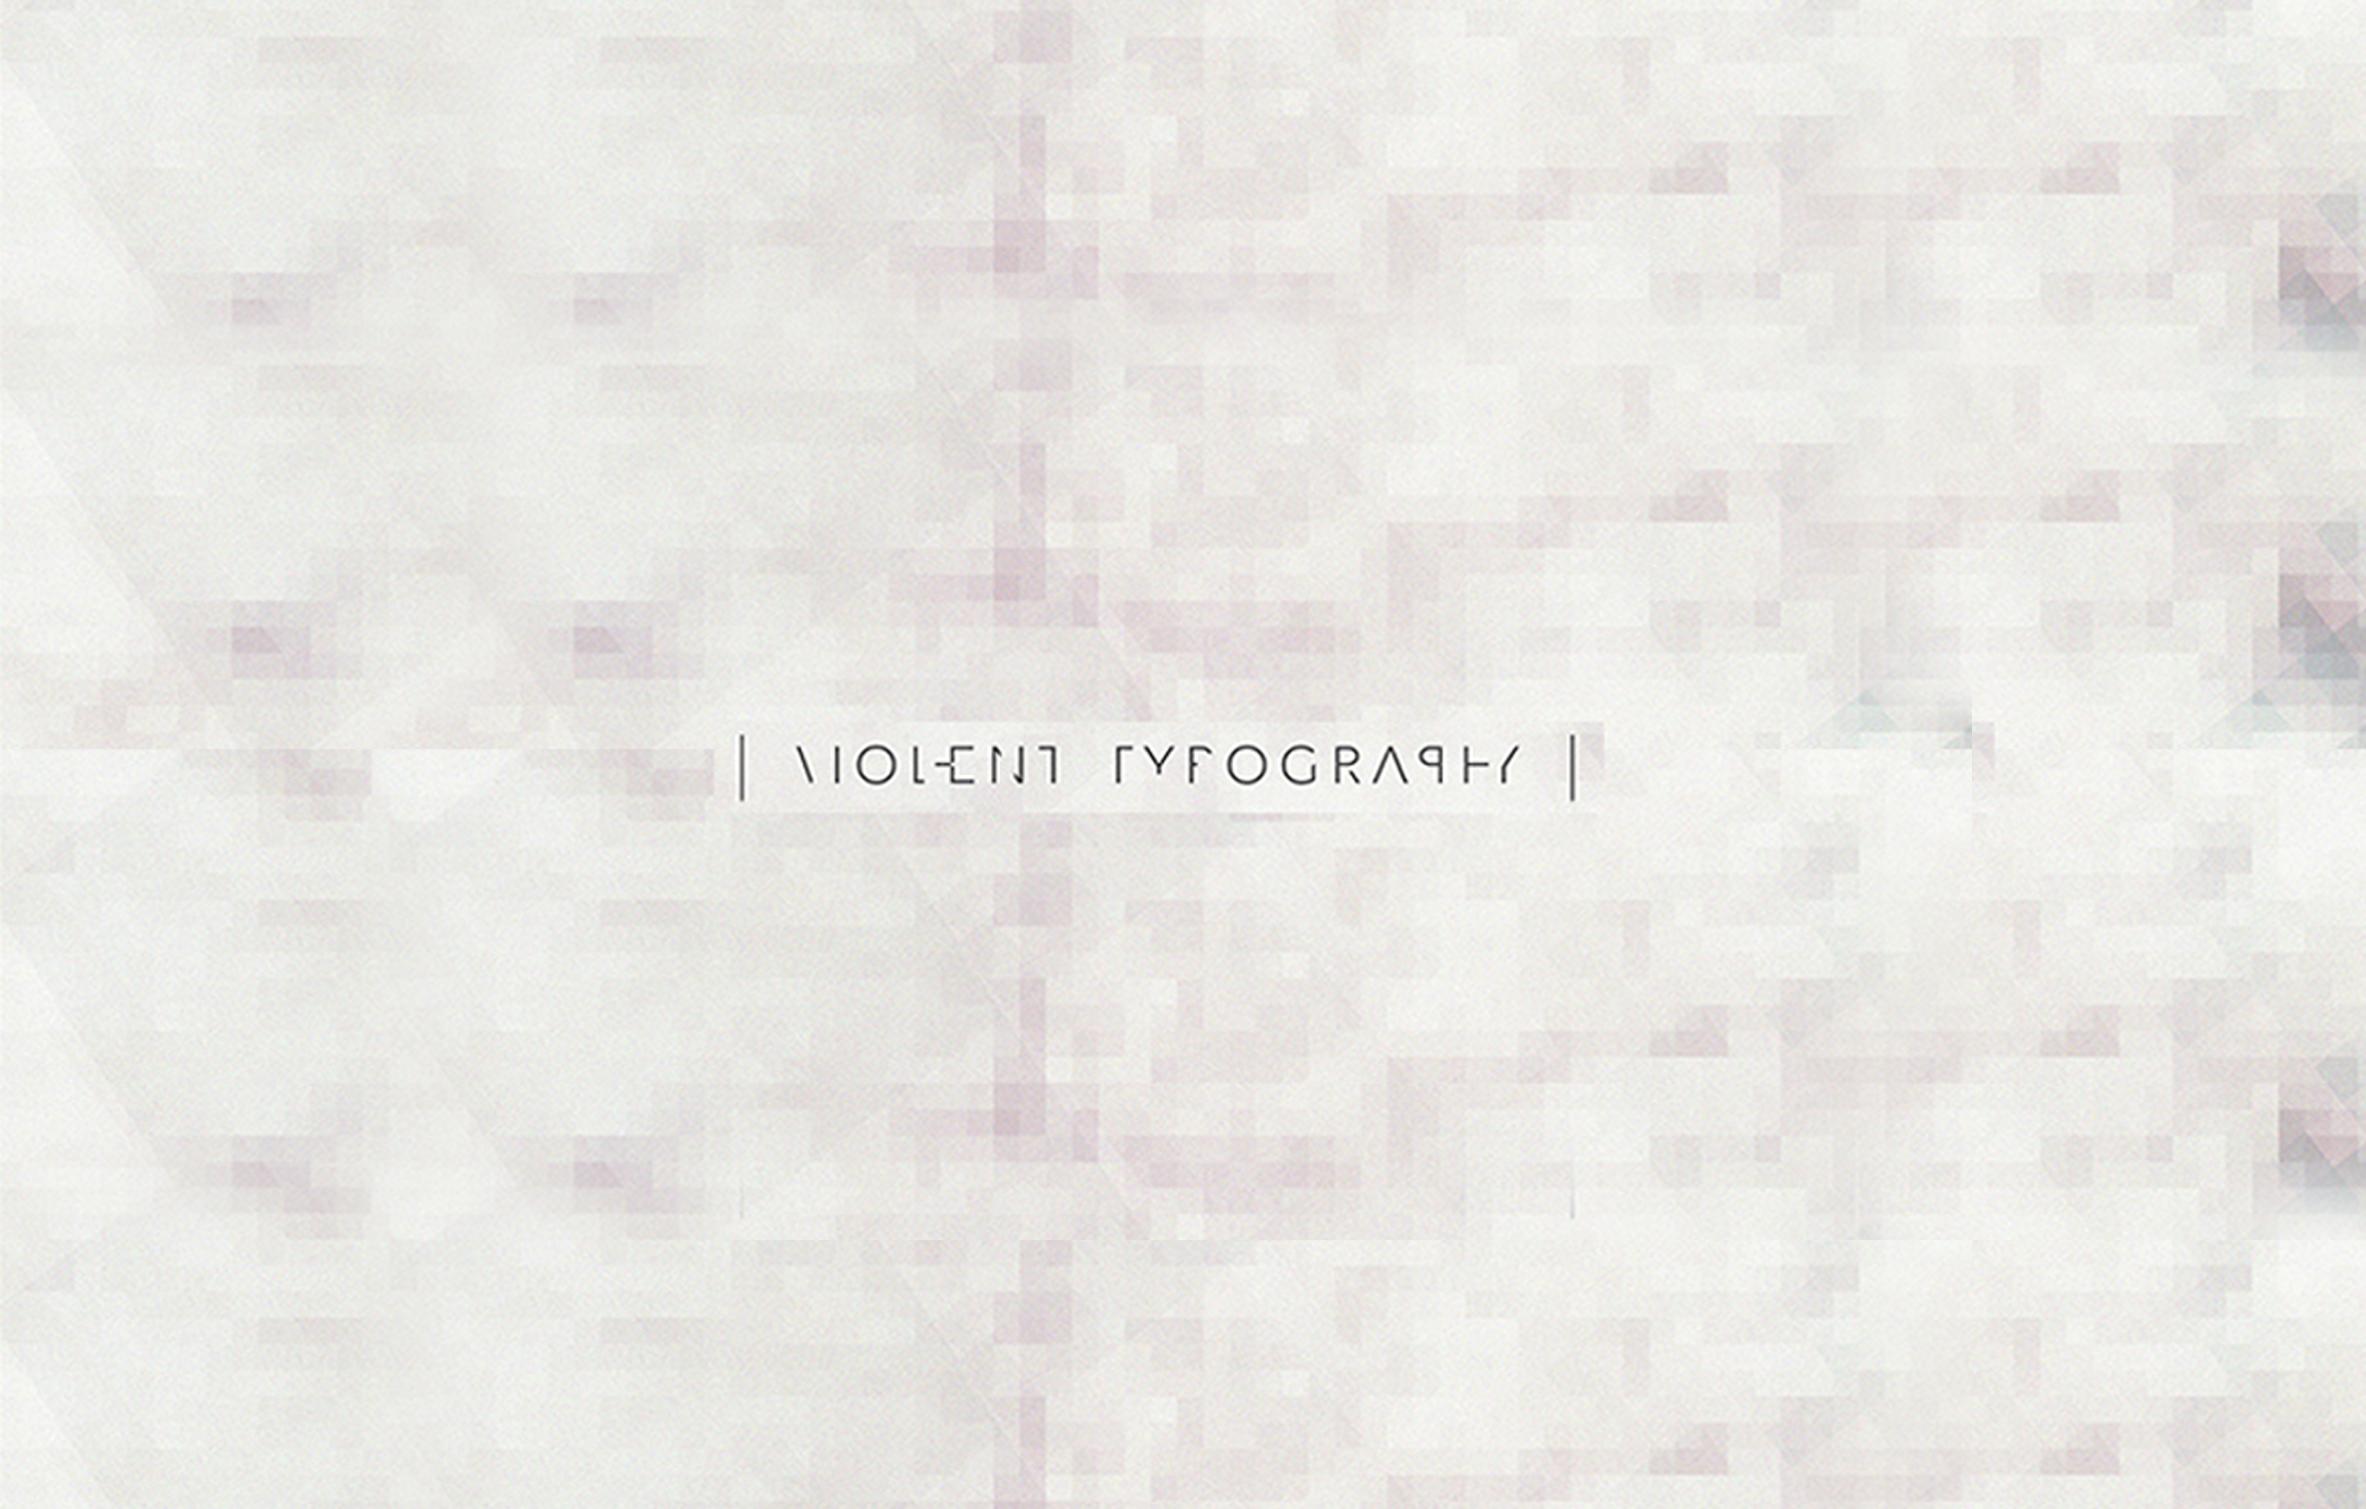 Violent Typography